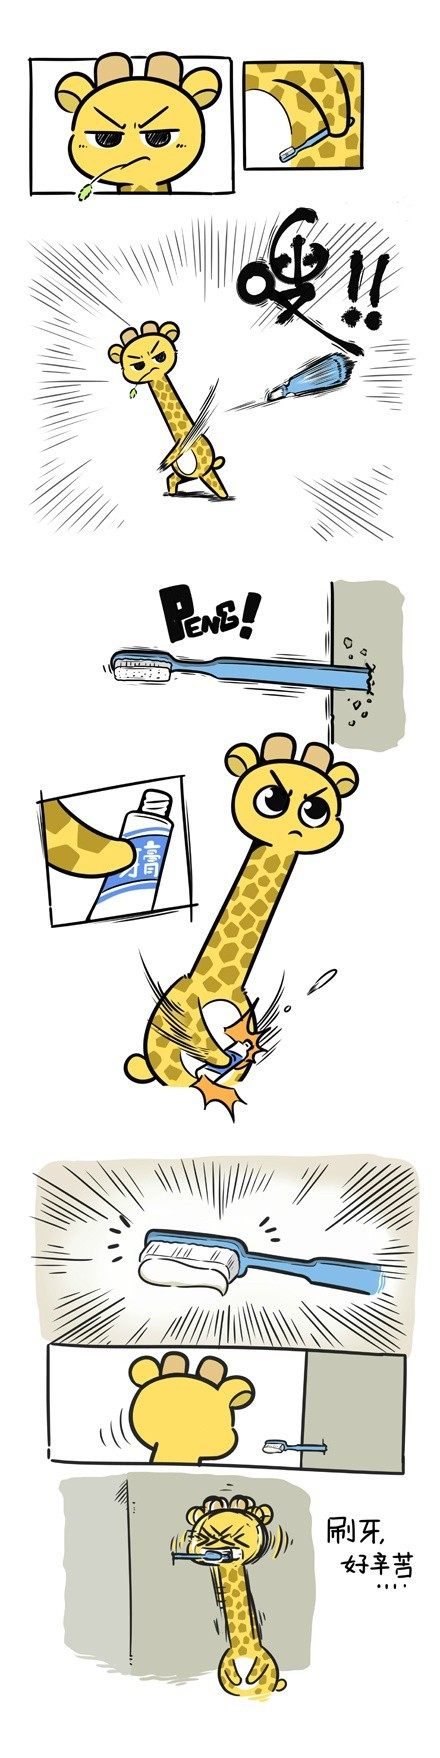 哈哈哈哈哈哈哈哈哈哈哈哈哈哈你个长颈鹿干嘛学人家刷牙